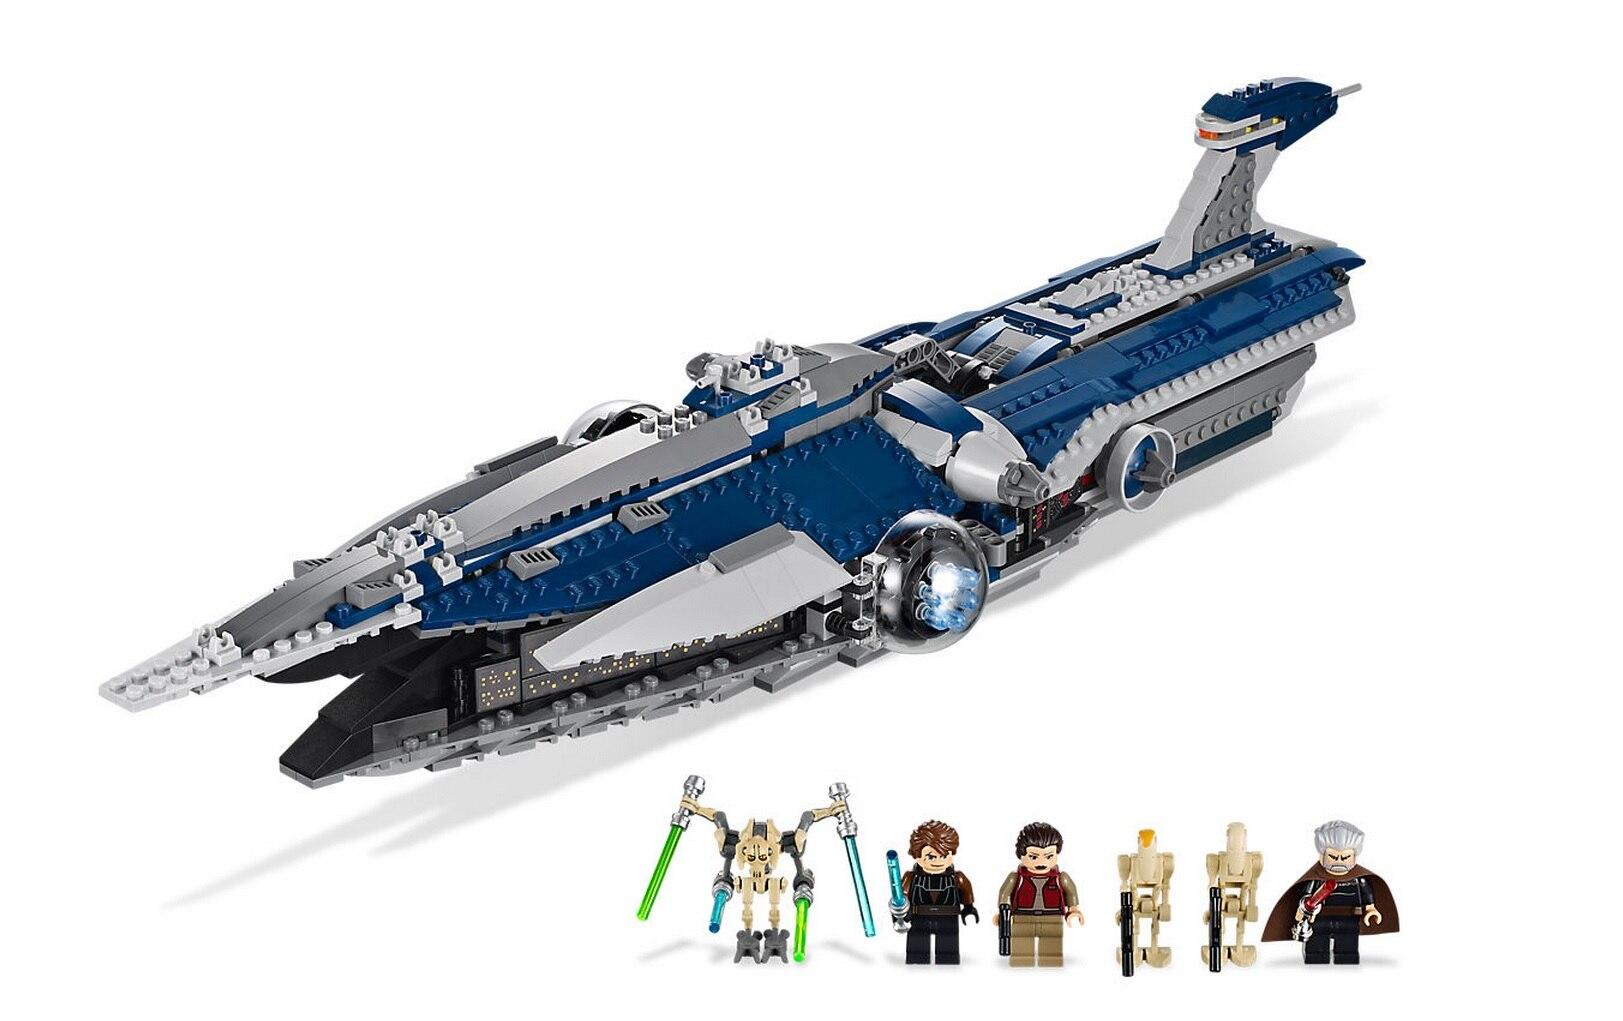 05072 Series The Limited Edition Malevolence Warship Set Children Building Blocks Bricks Boy`s Toys Model 9515 bricks